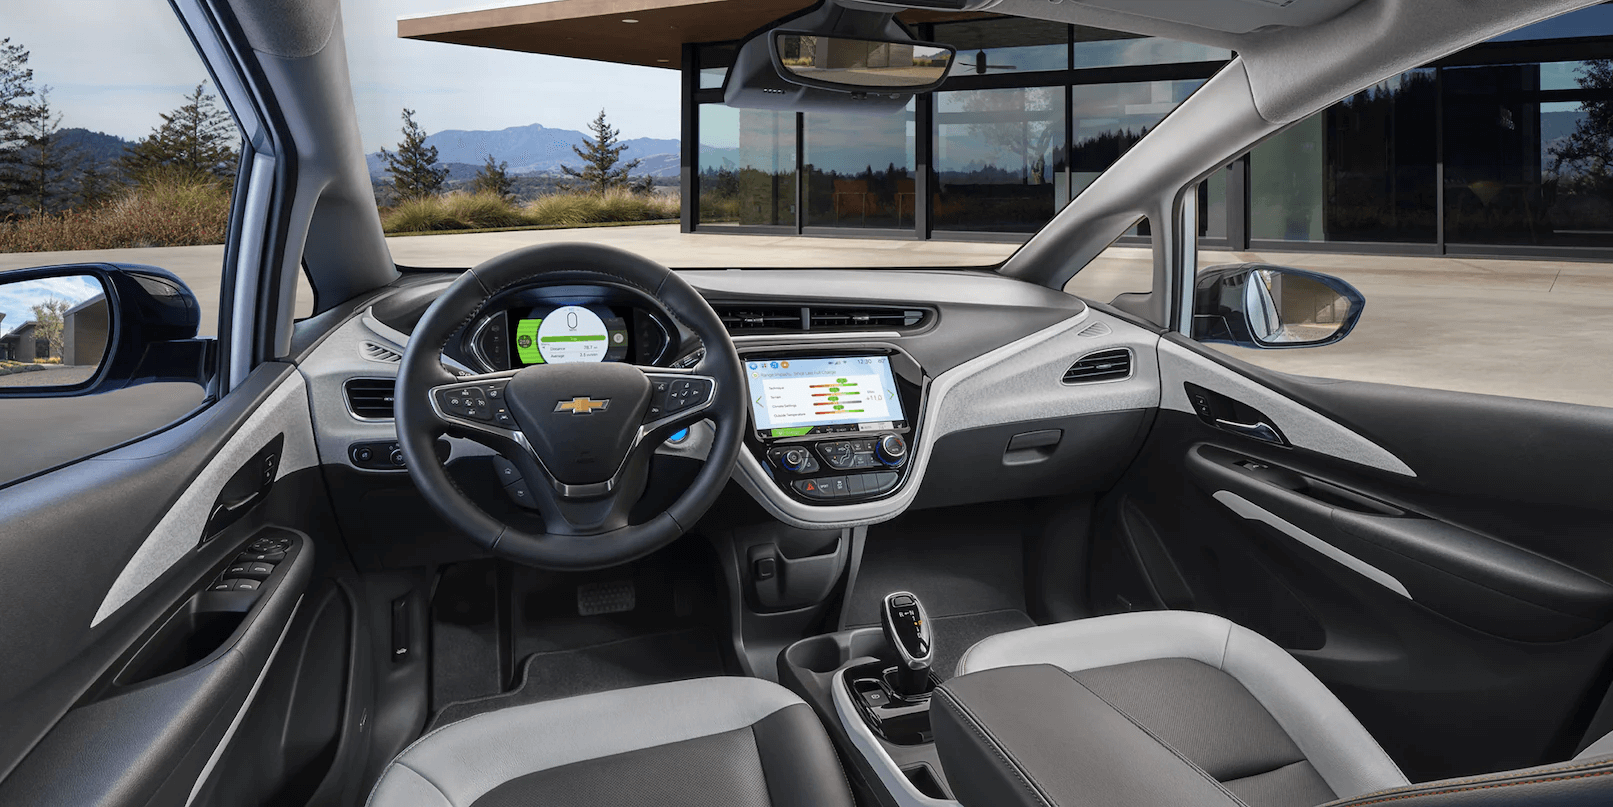 2021 Bolt EV Electric Car Interior Photo: Dashboard Daylight.